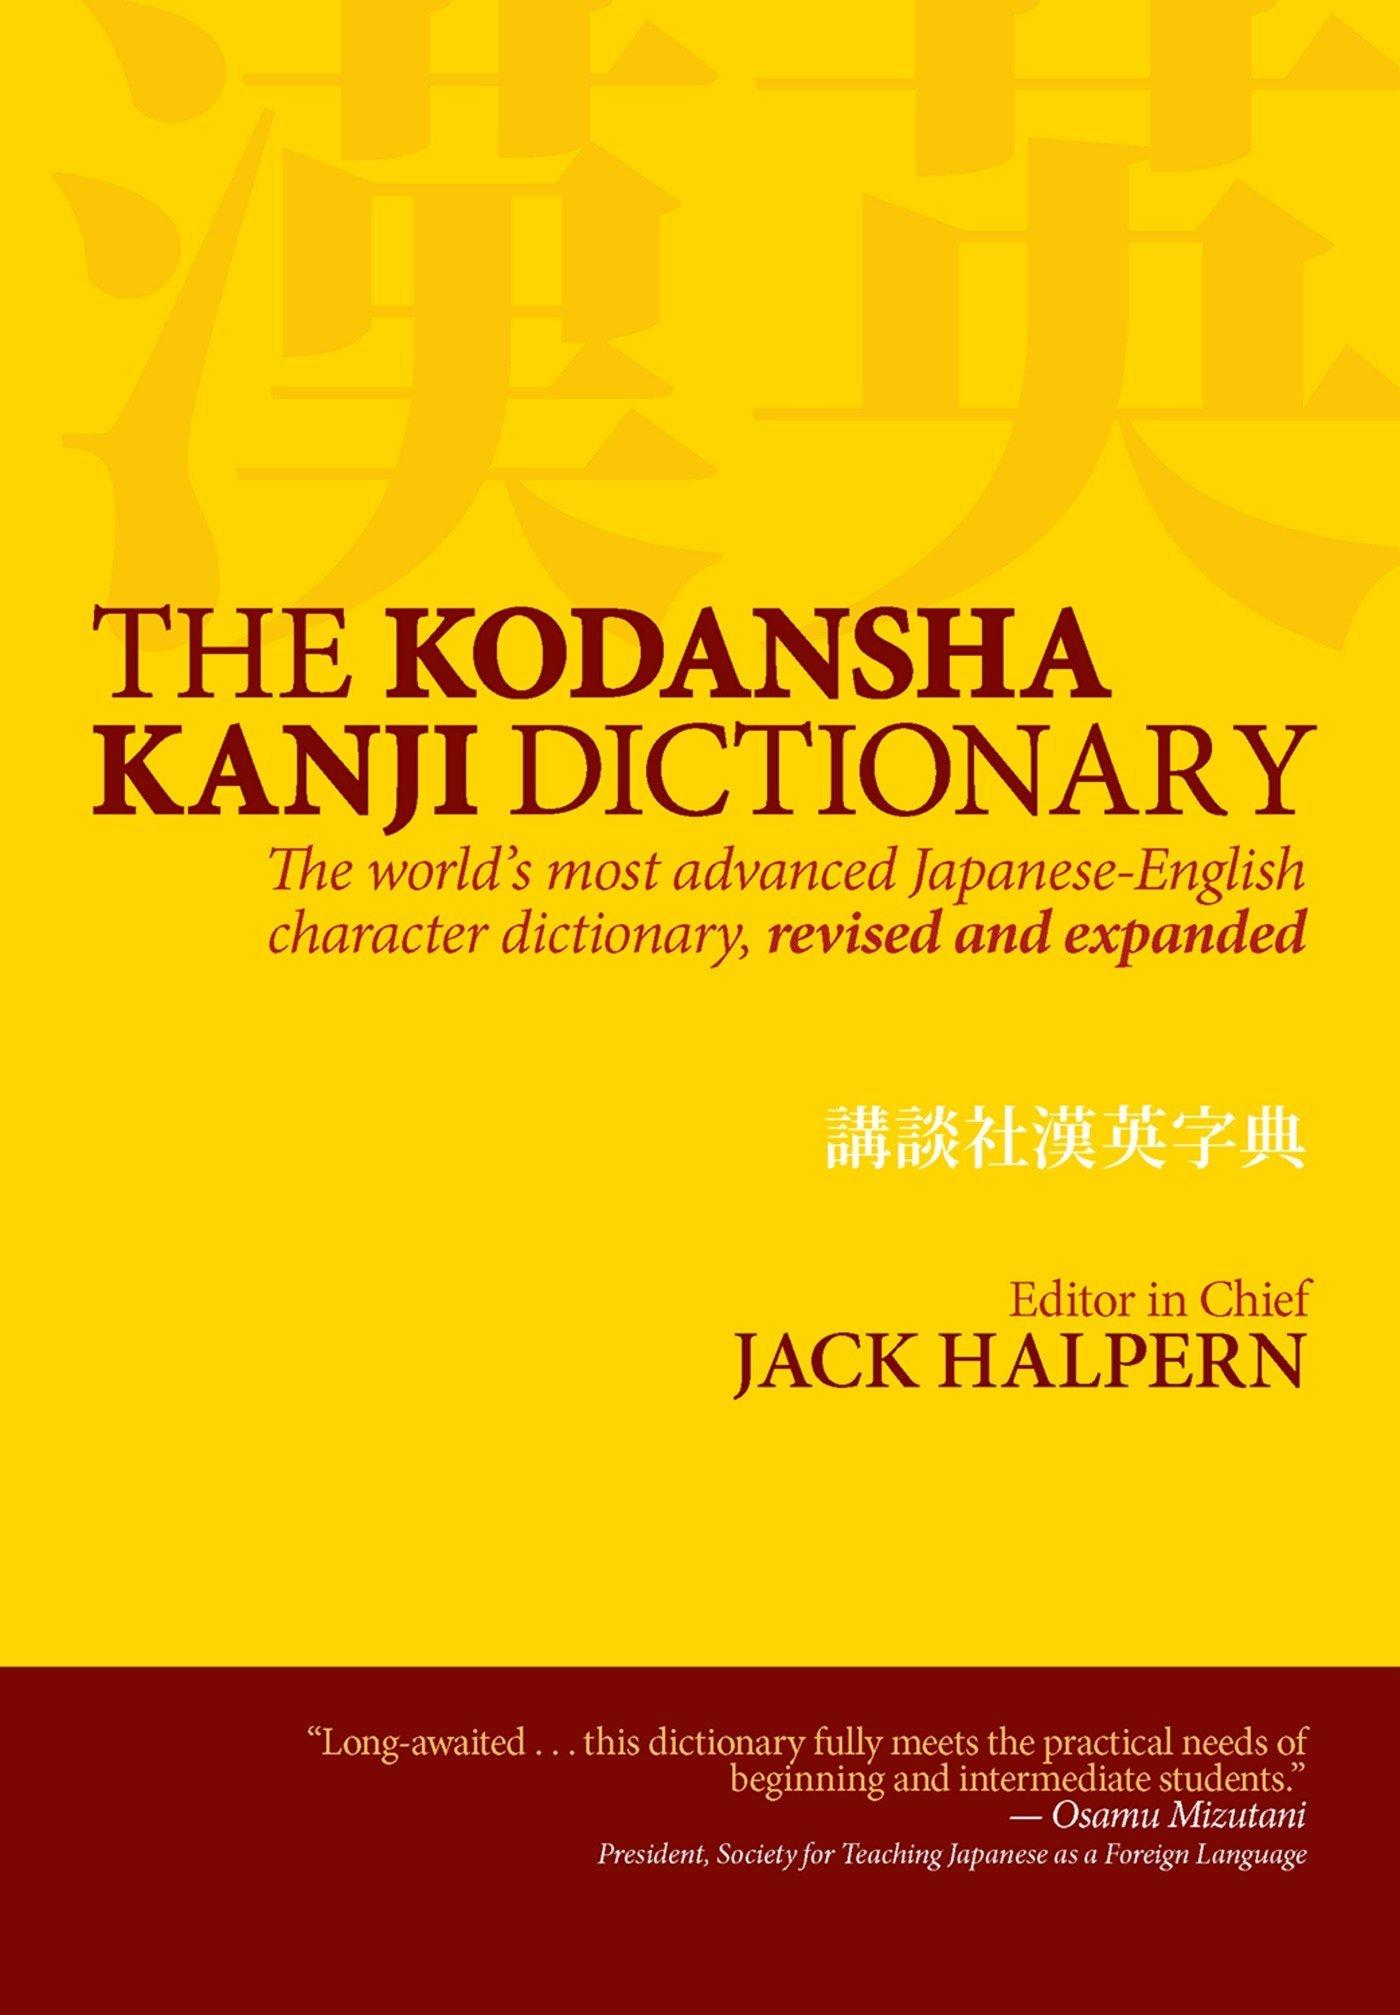 The Kodansha Kanji Dictionary